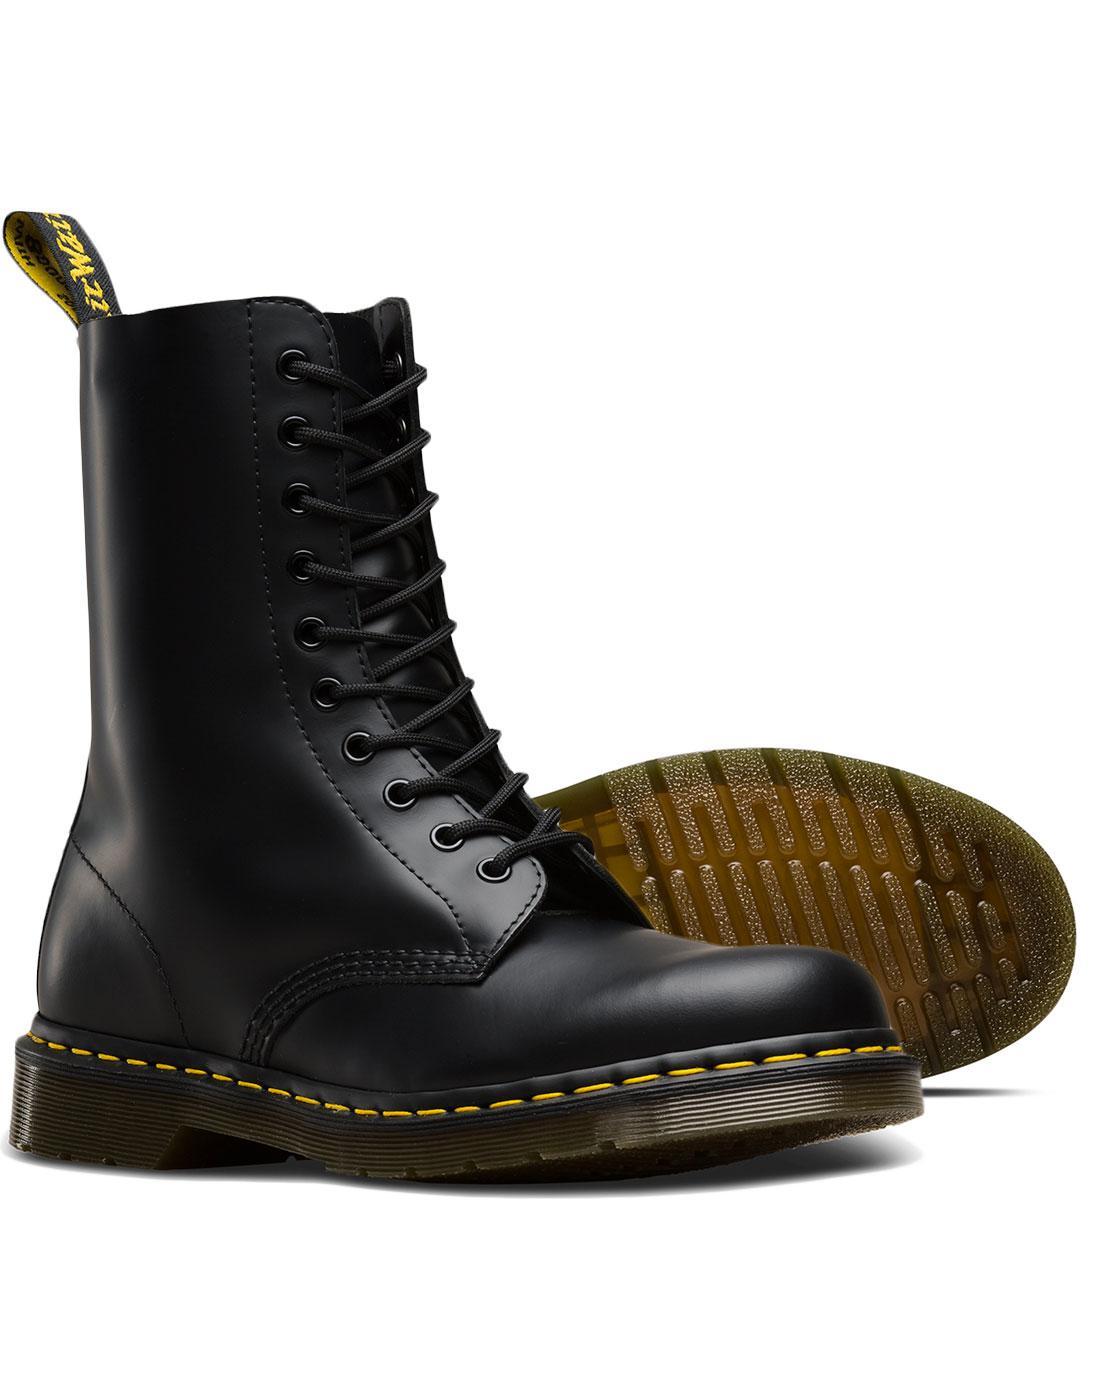 intermittent Peddling except for  DR MARTENS 1490 Smooth Men's Mod 10 Eyelet Boots Black